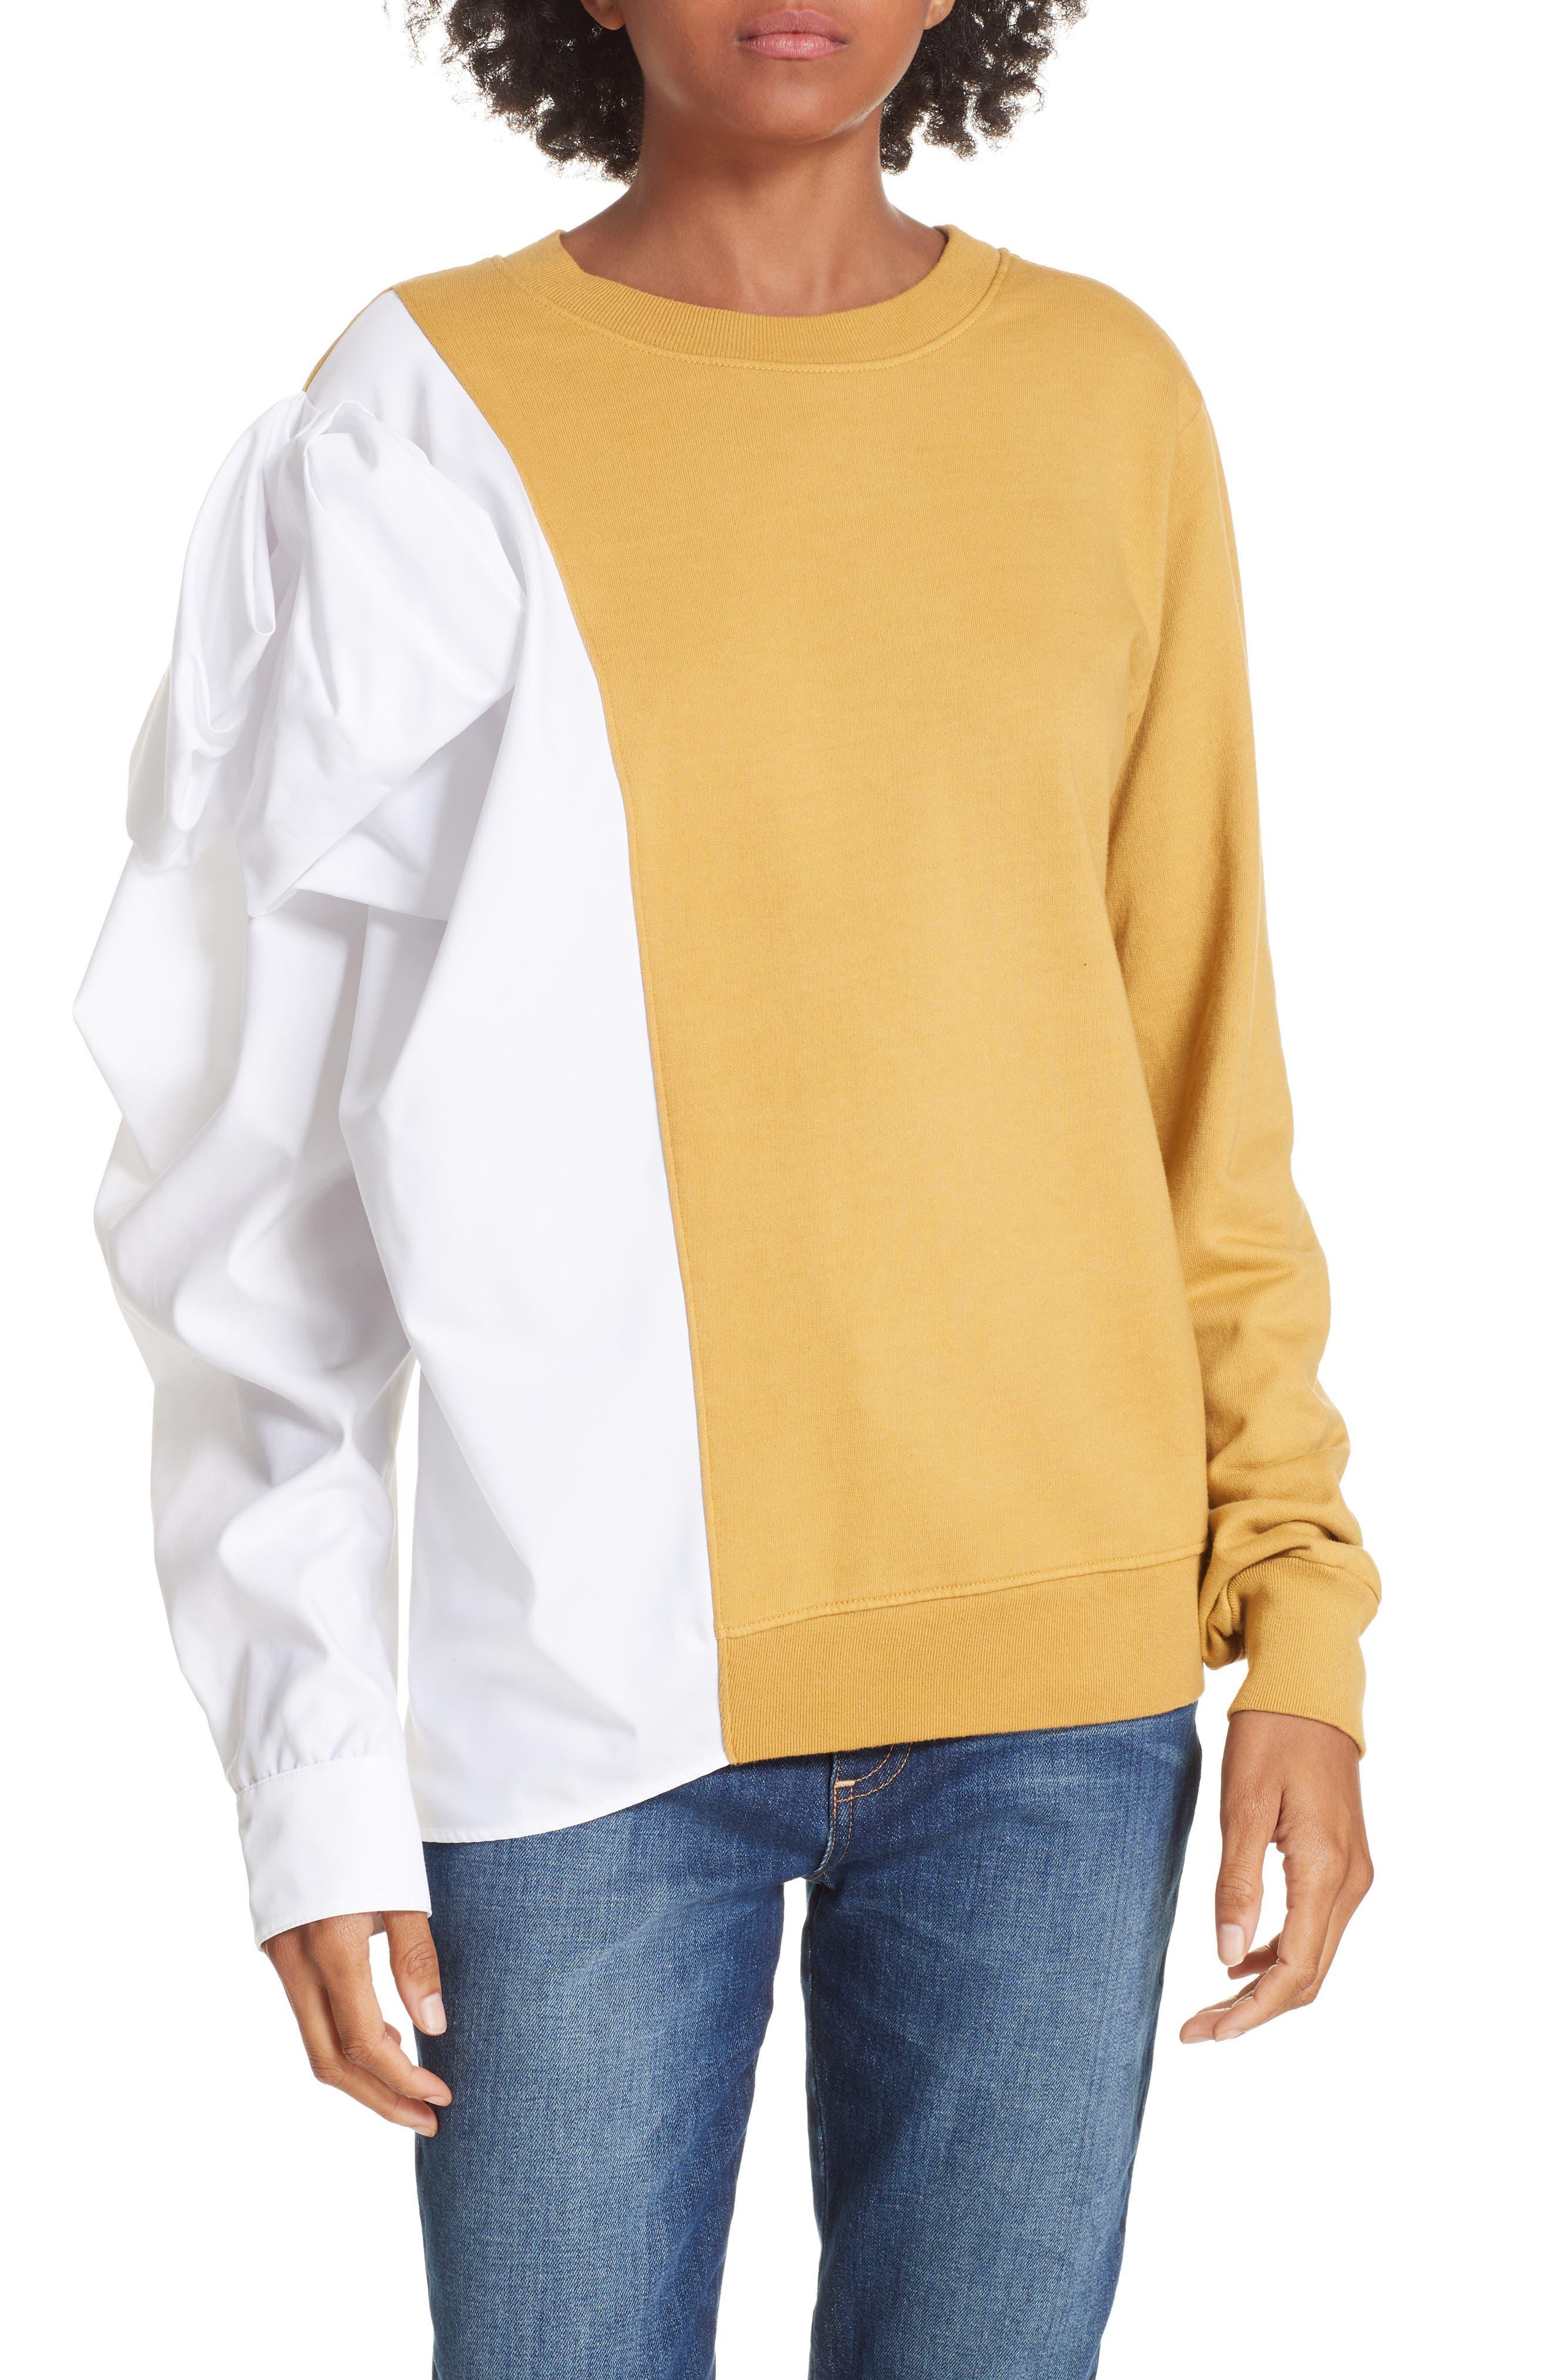 Bow Colorblock Sweatshirt,                         Main,                         color, MUSTARD/ WHITE